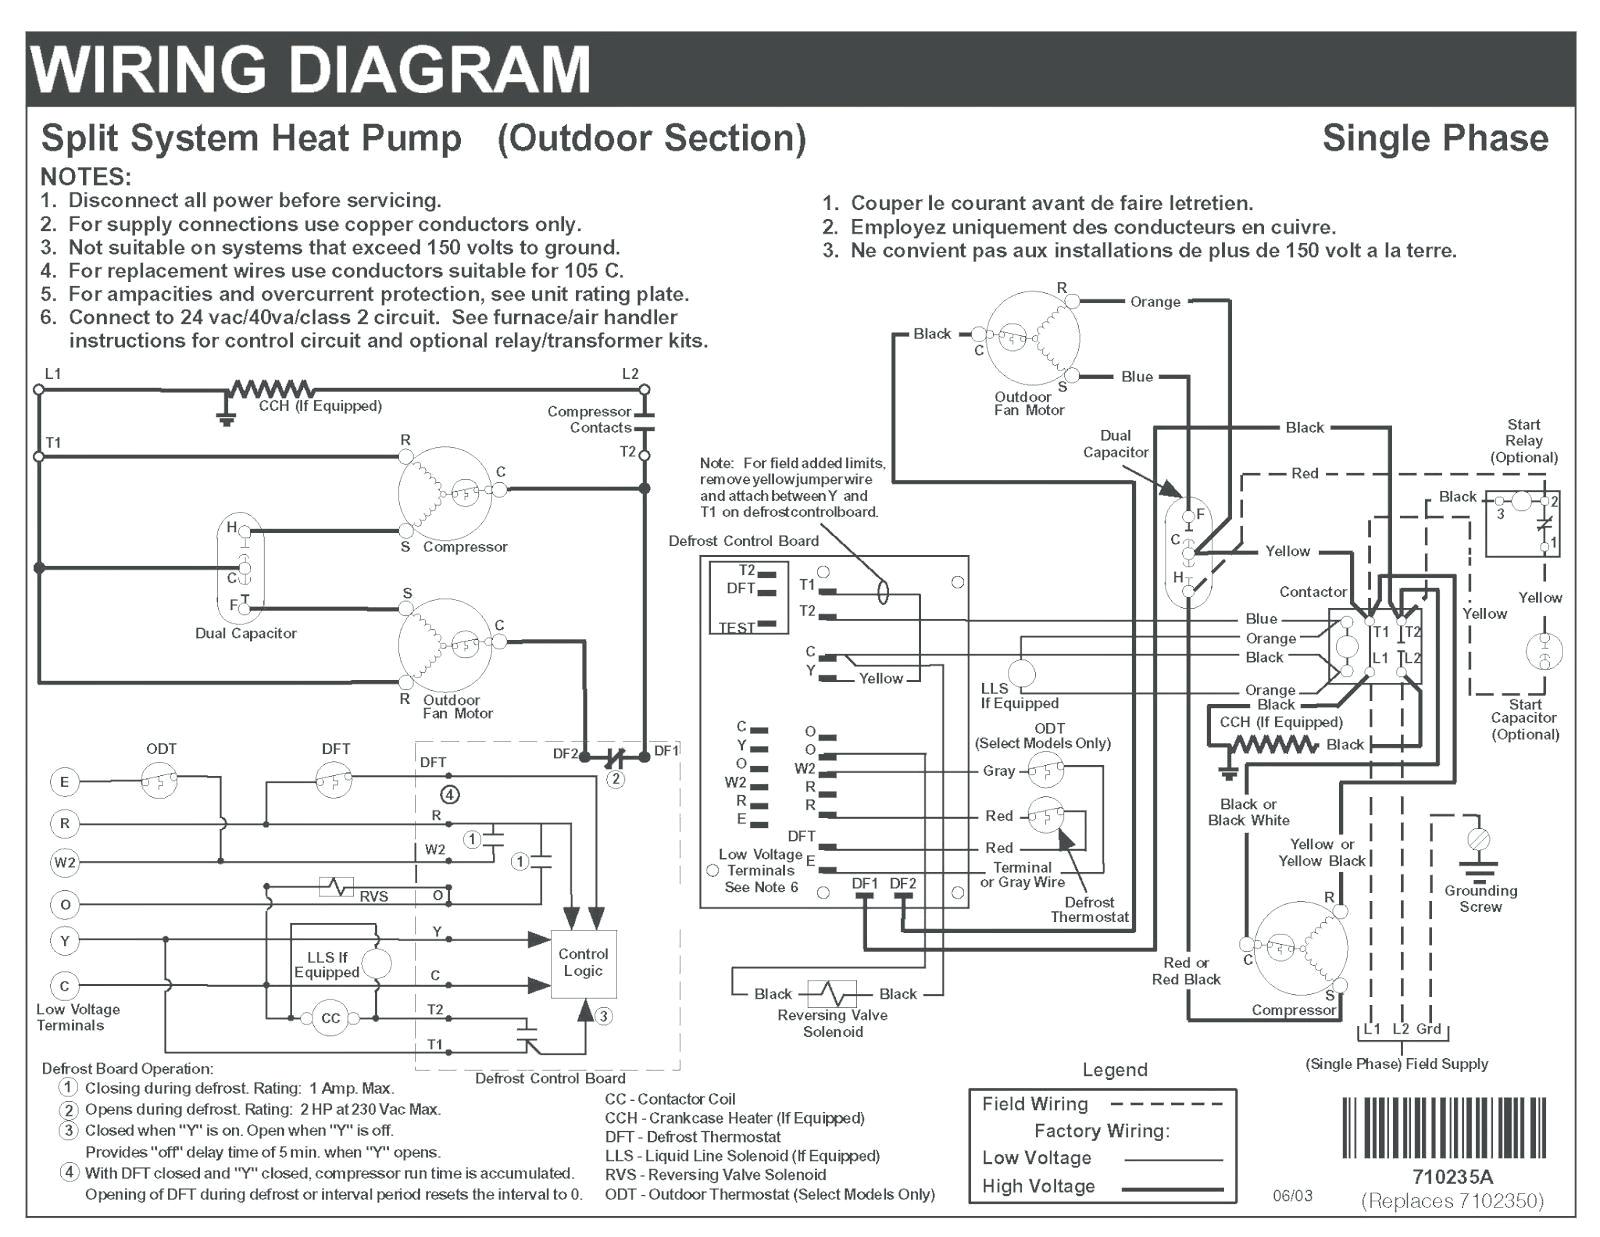 pioneer avic x930bt wiring diagram inspiration pioneer avic x930bt wiring diagram 3 way switch pilot light